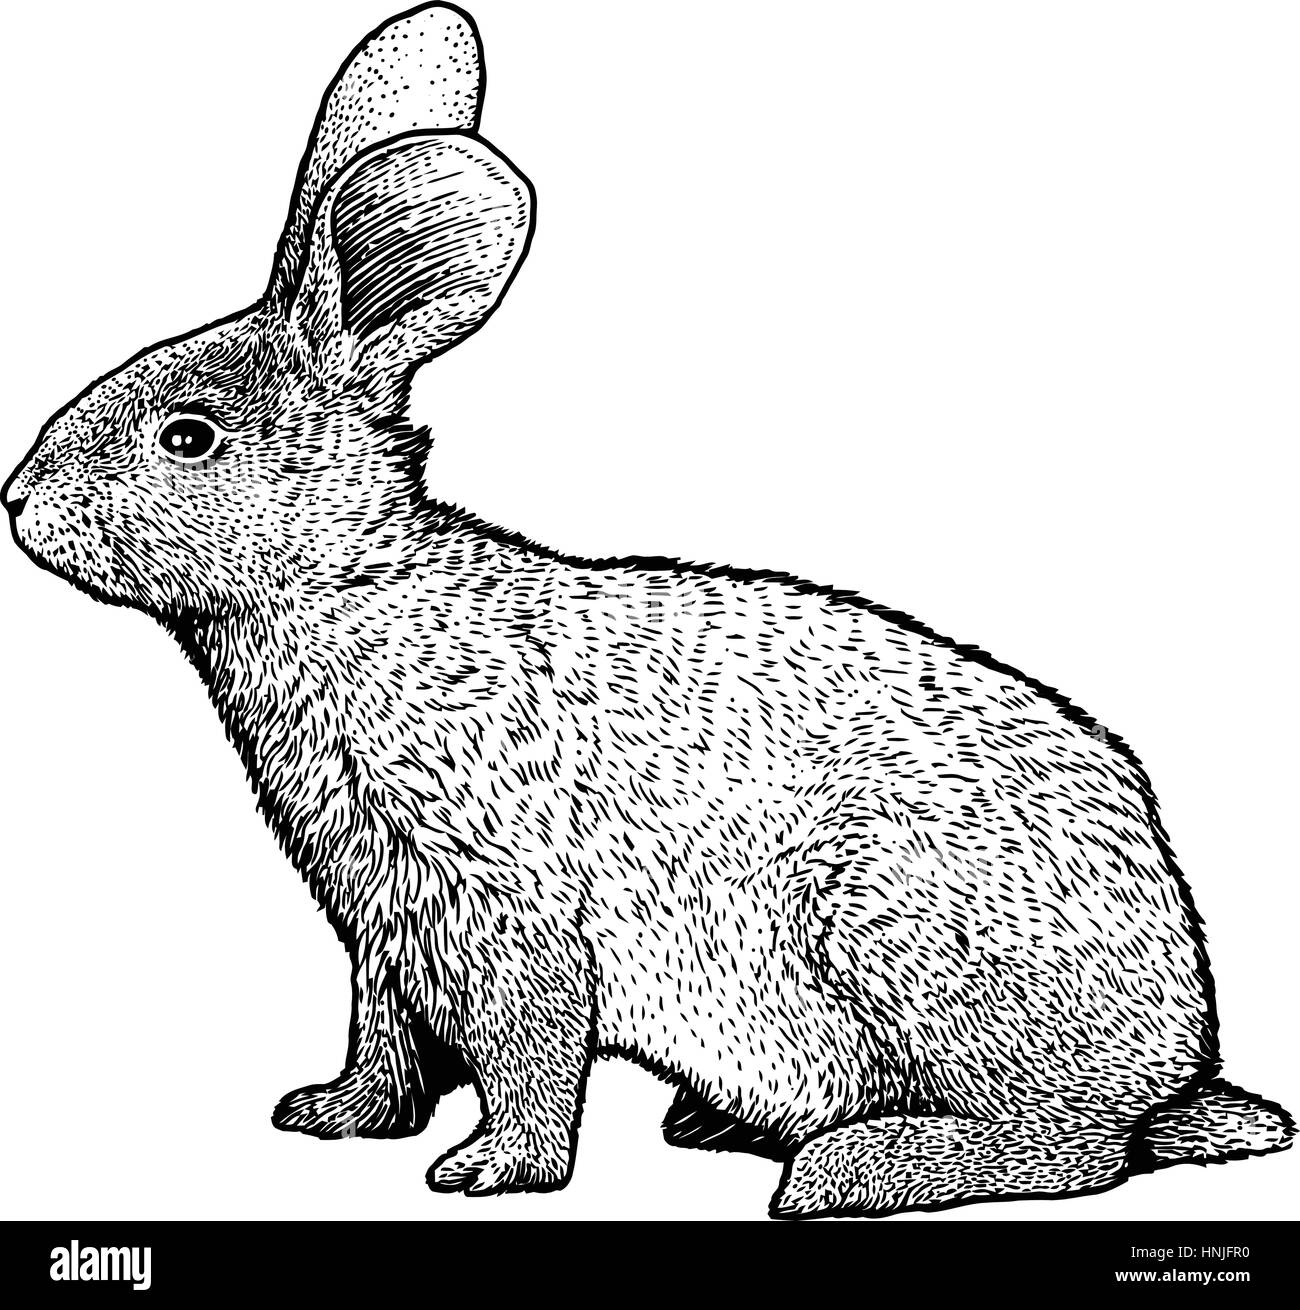 Rabbit illustration drawing engraving line art realistic Stock